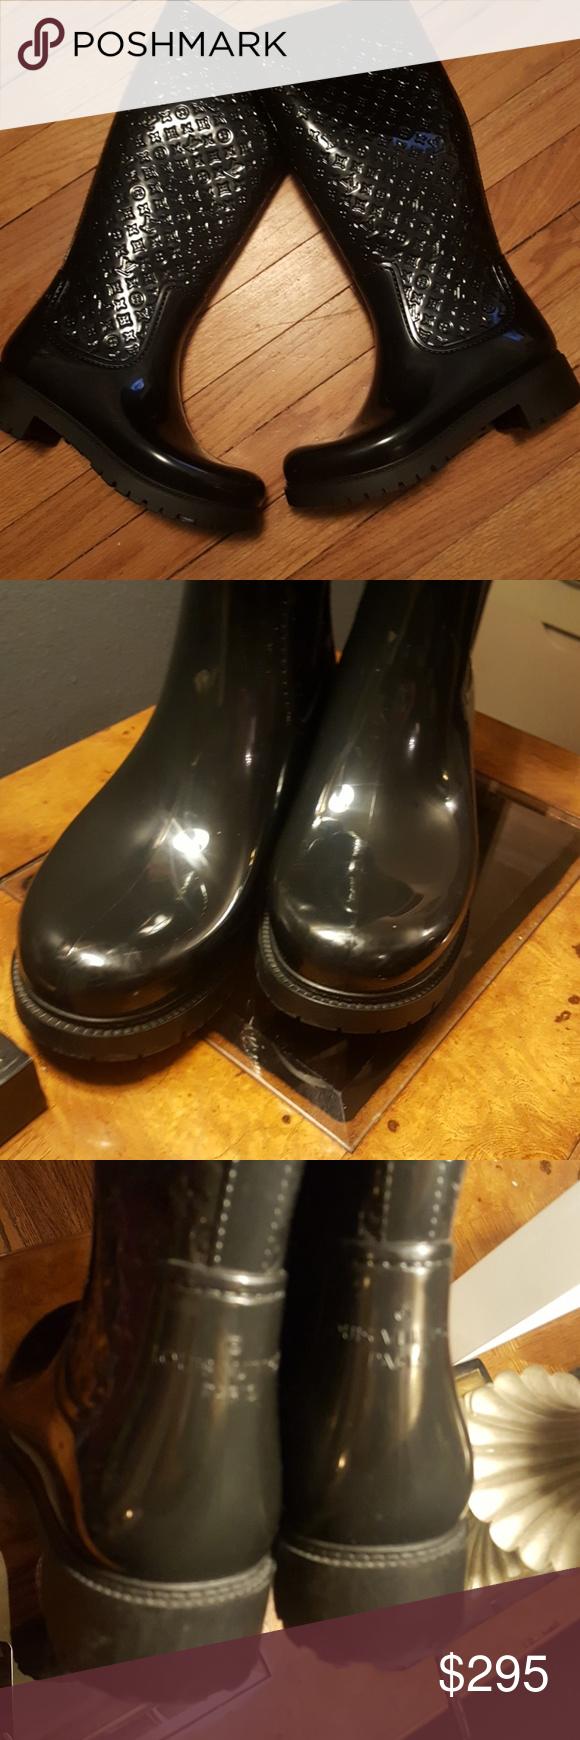 ac7fa5afd0a Louis Vuitton Monogram Rubber Rain Boots in 2018